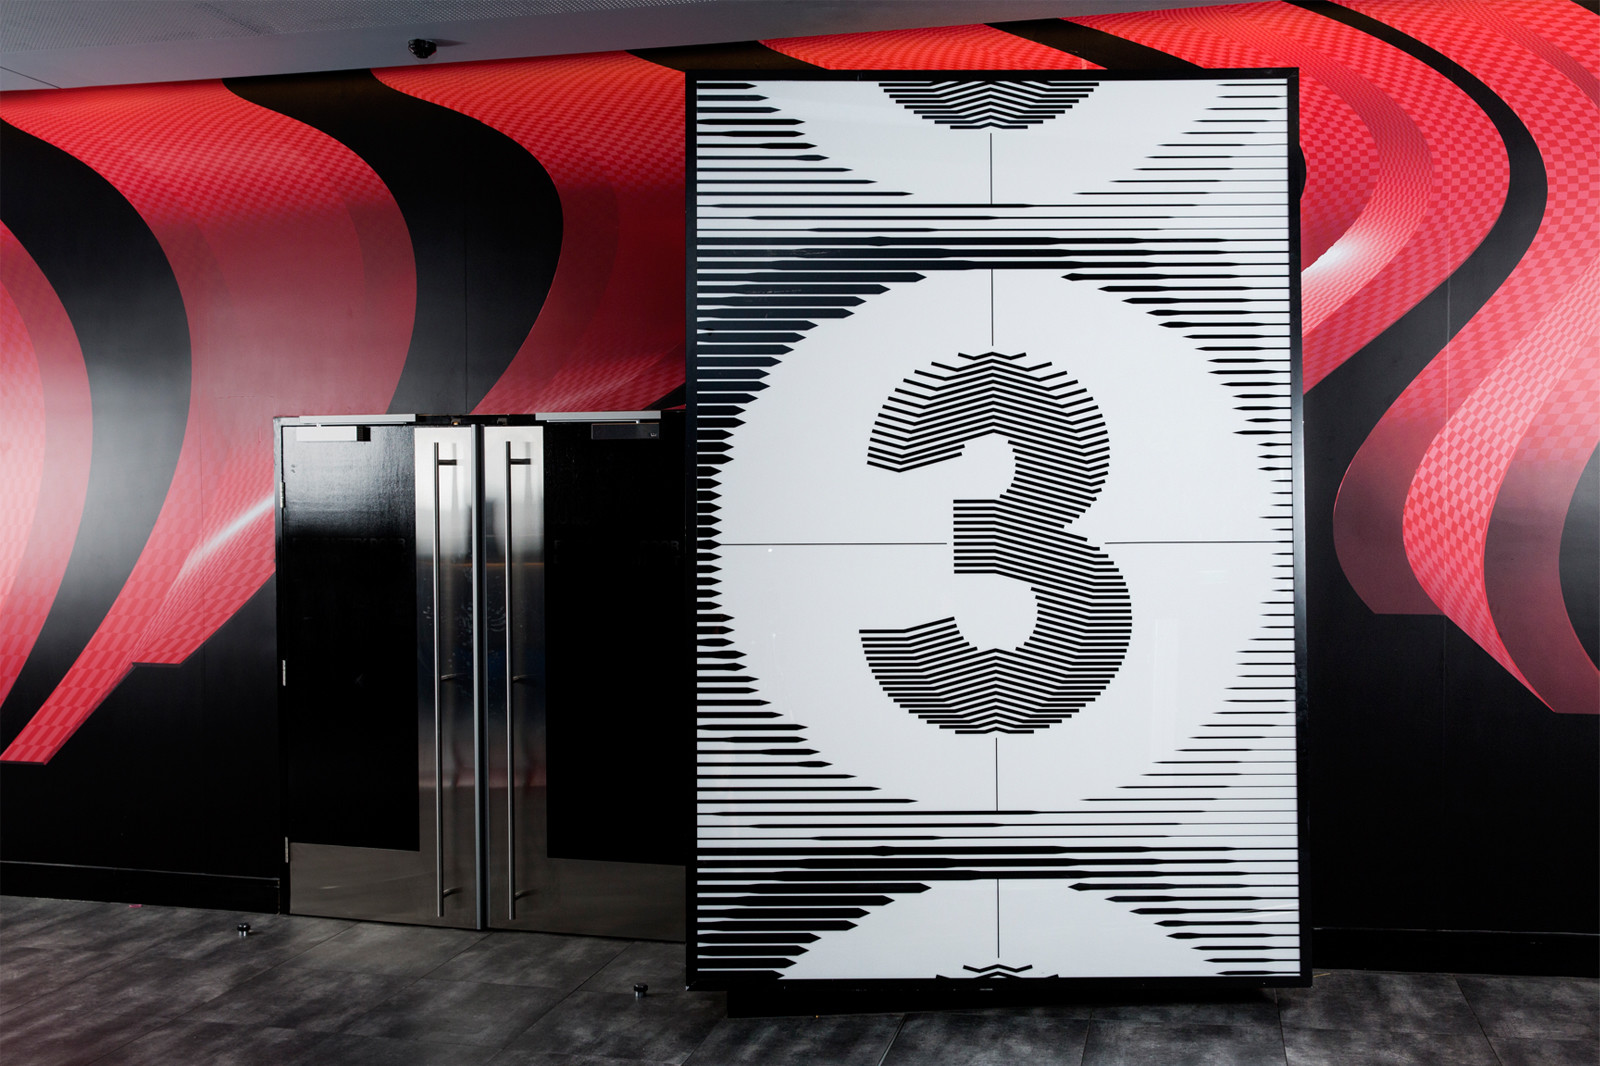 Event Cinemas影院指示系统 © Deuce Design